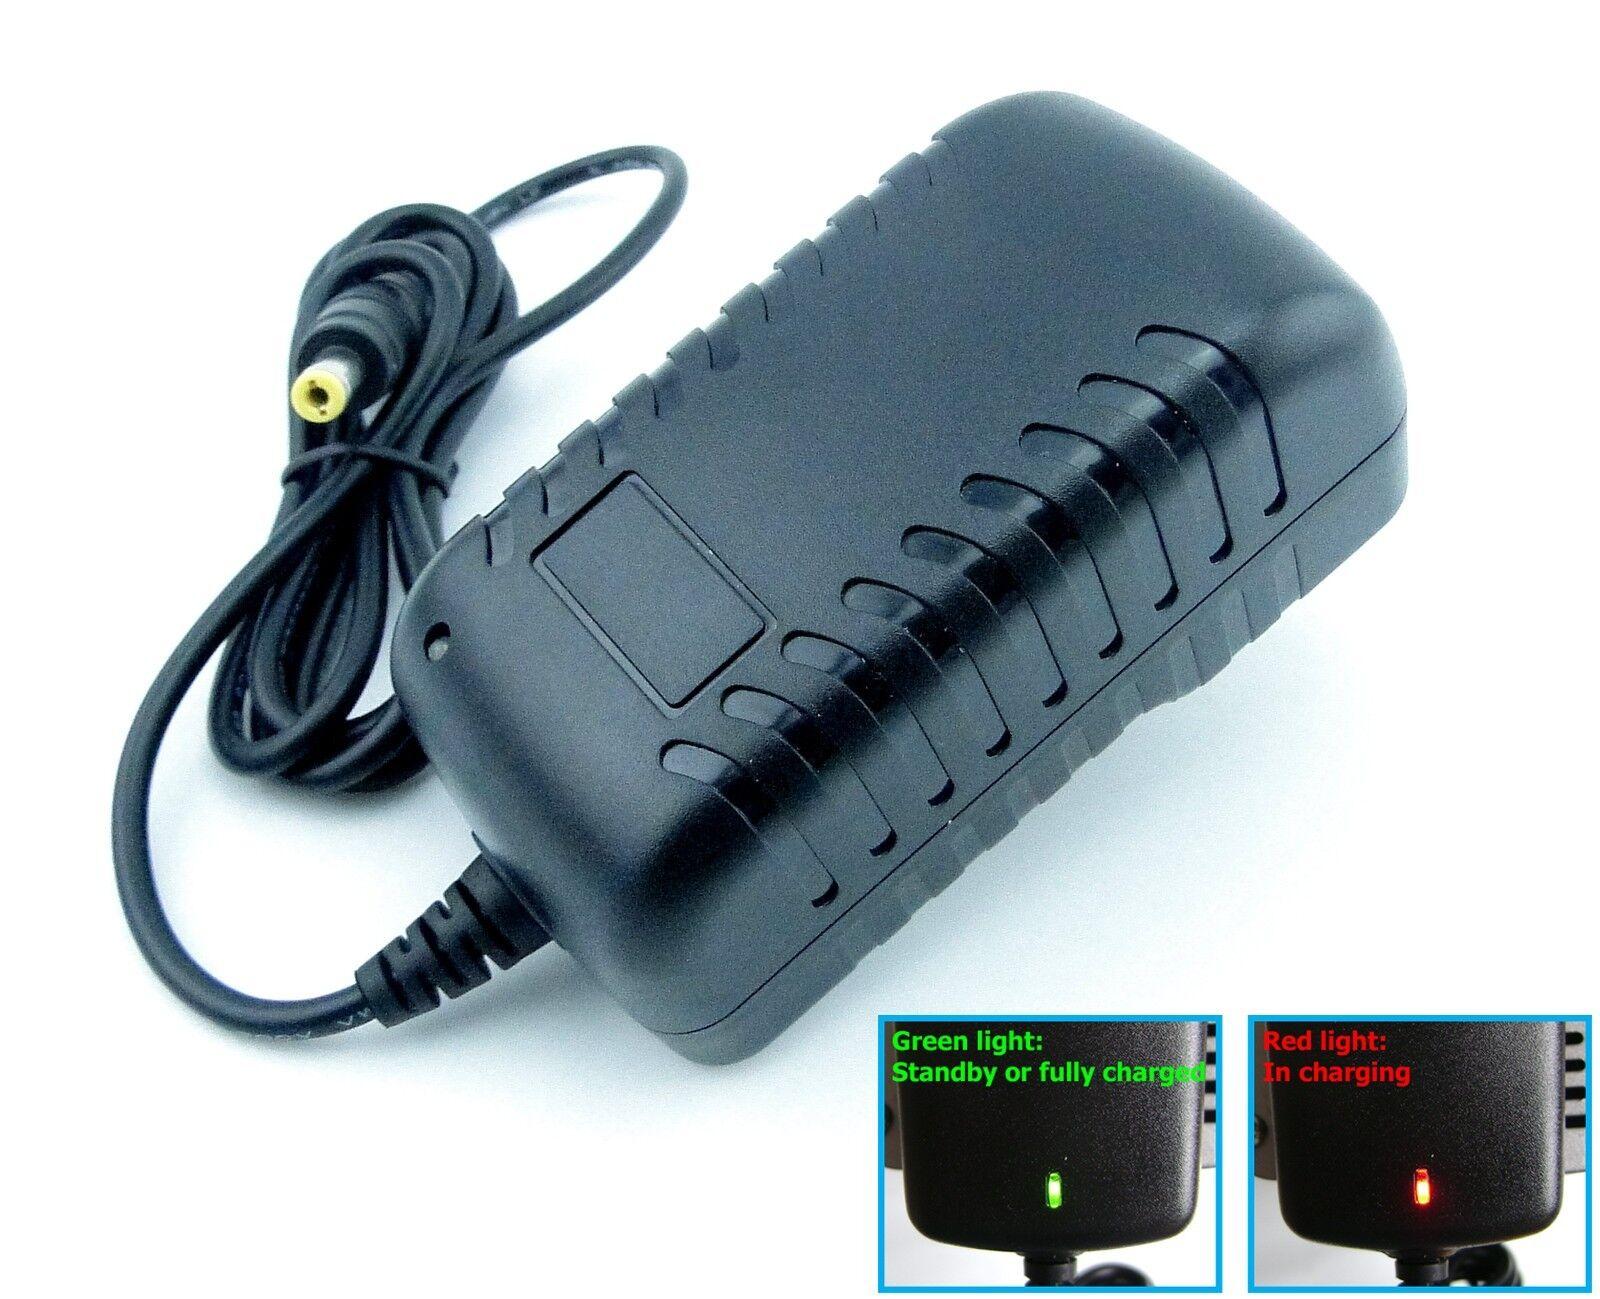 10Pcs 4.2V Smart Charger 3A for 3.7V Li-ion LiPo Battery w/One Removable Plug